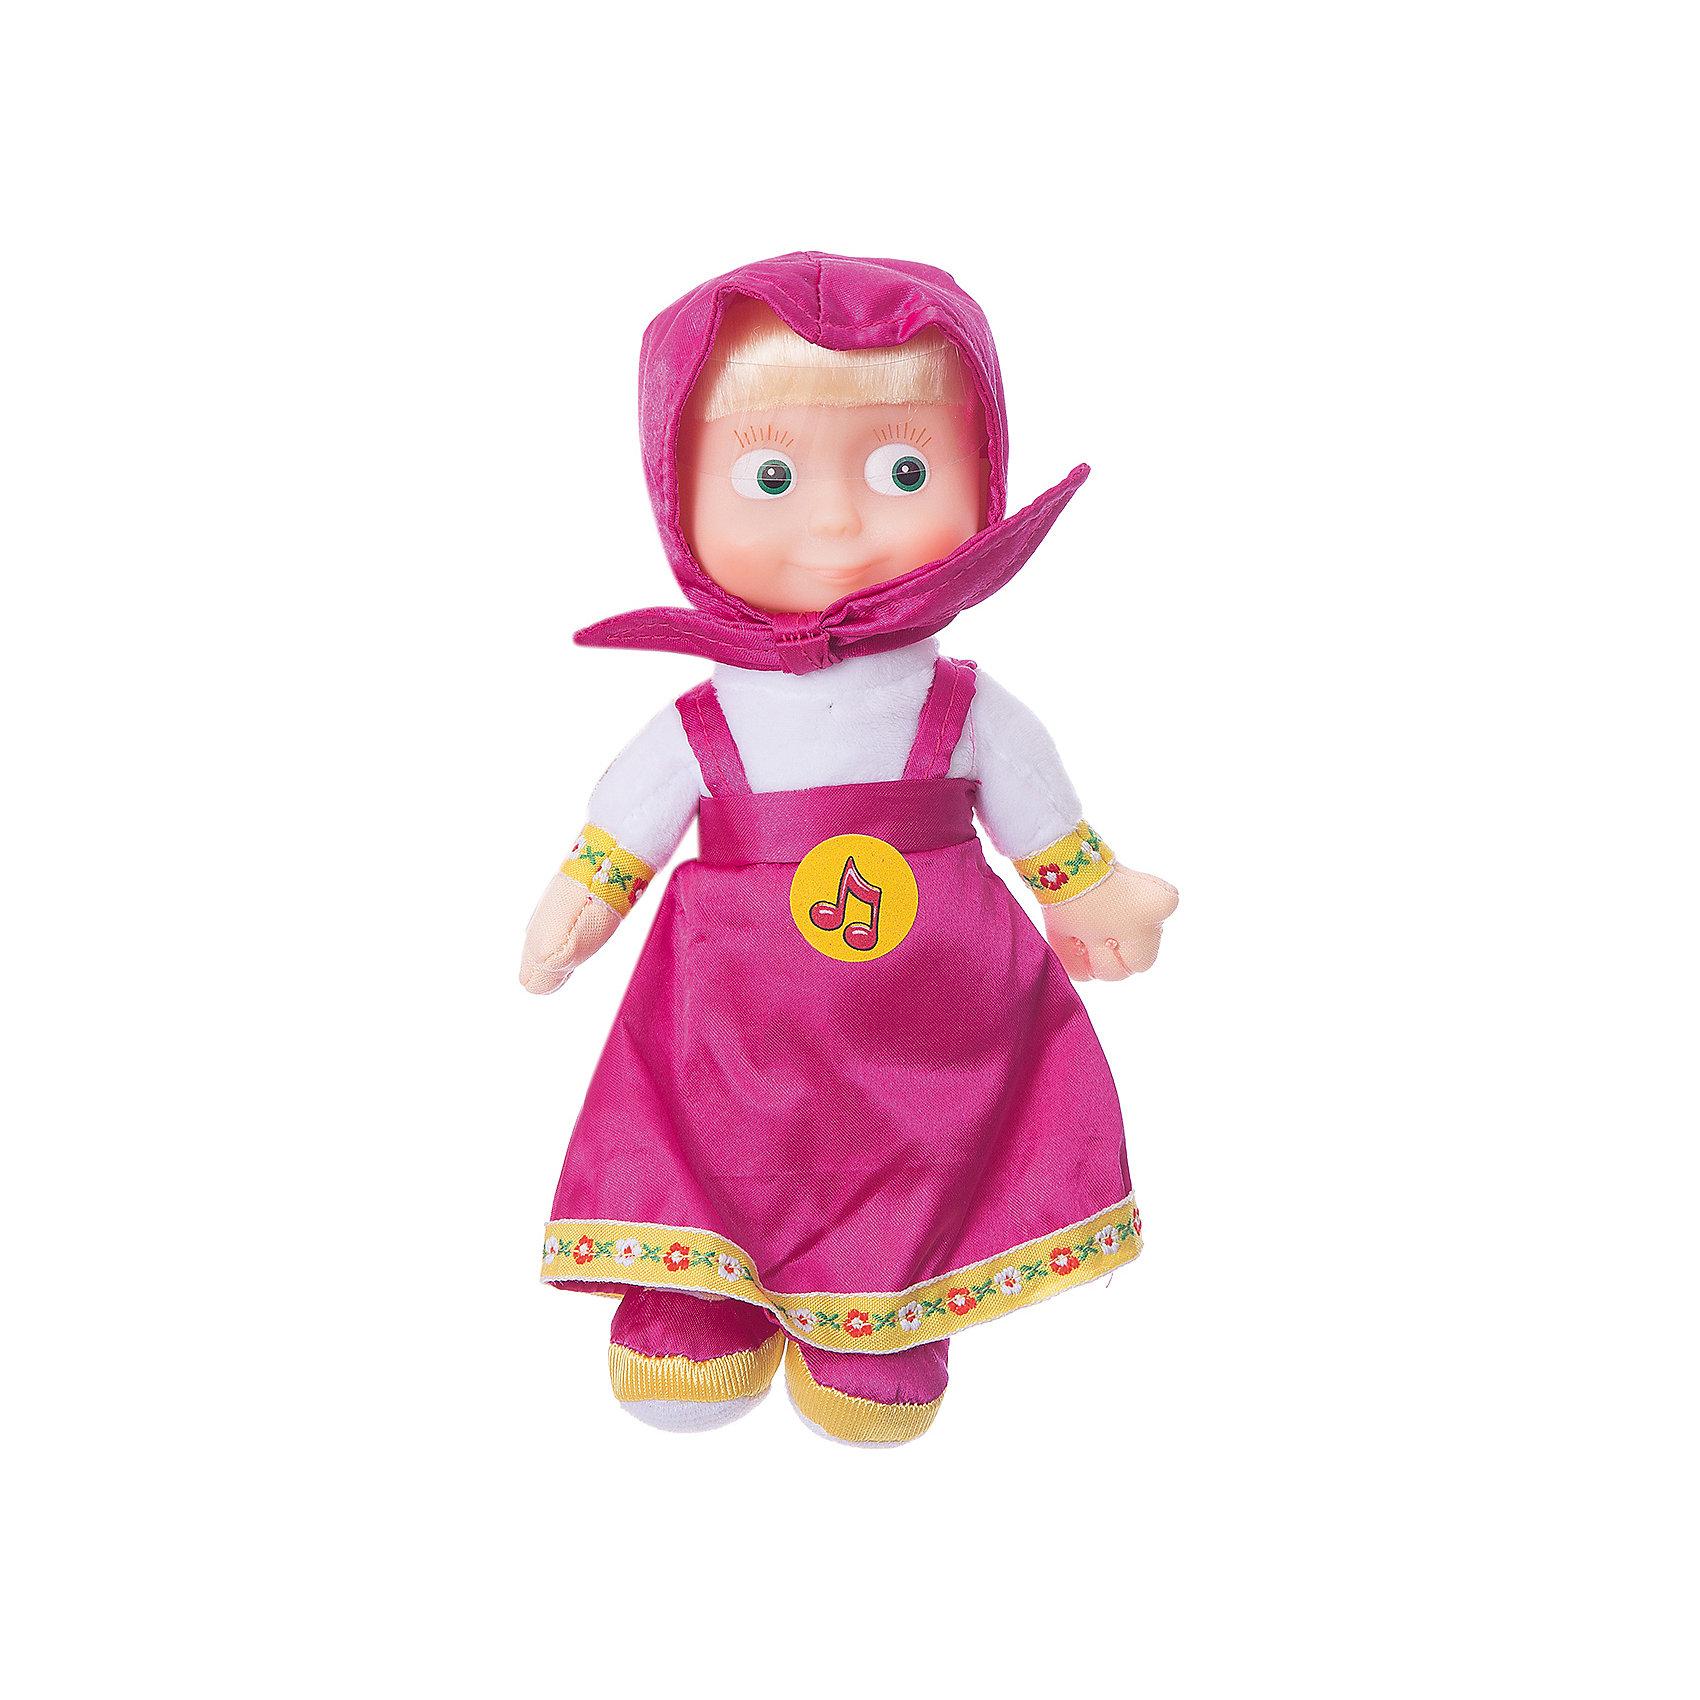 МУЛЬТИ-ПУЛЬТИ Мягкая кукла Маша,  22 см., Маша и Медведь,